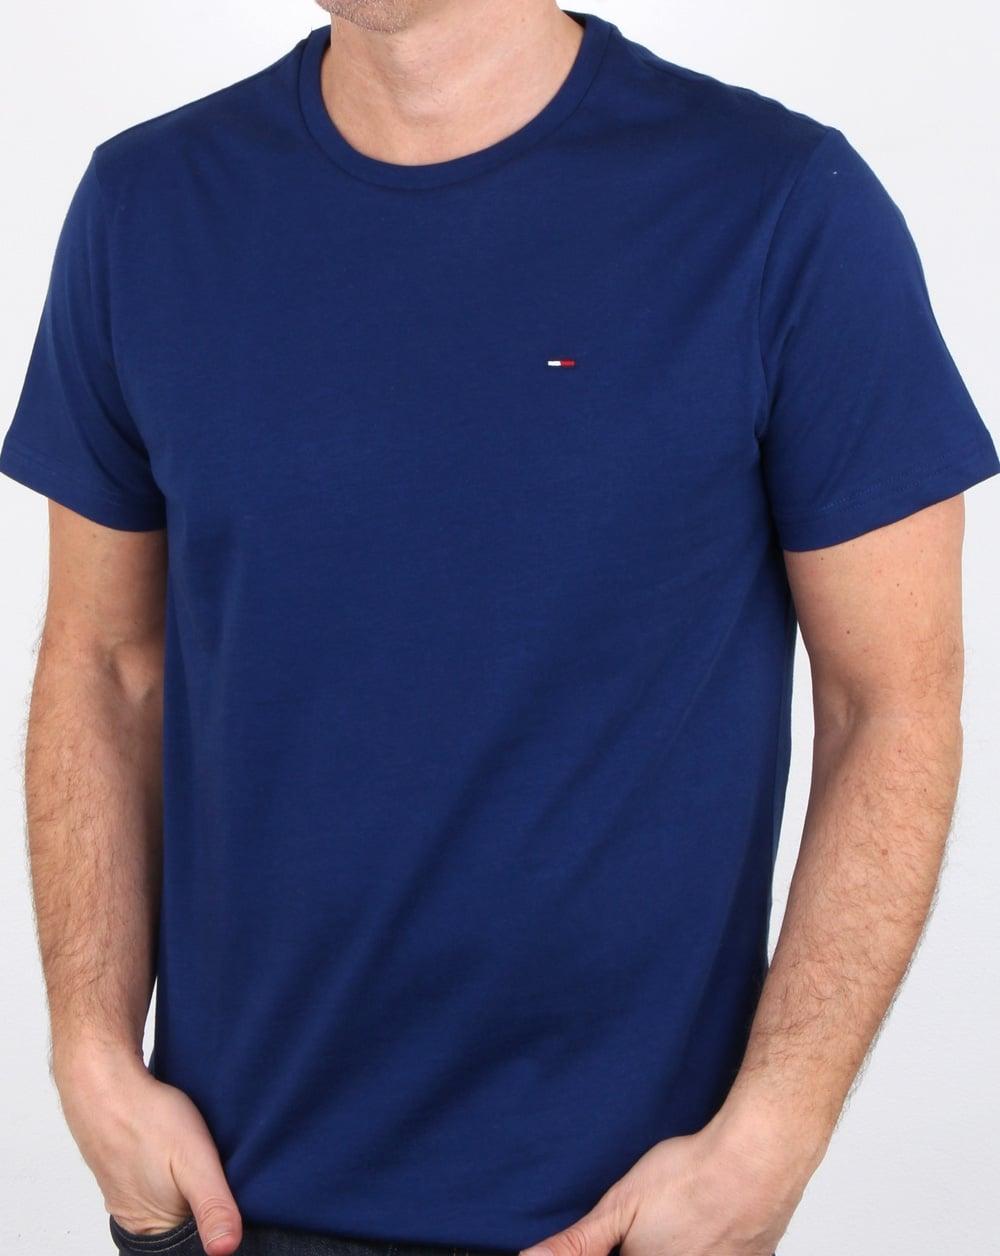 f90491c6ffca Tommy Hilfiger Jeans Tommy Hilfiger Cotton Crew Neck T Shirt Blue